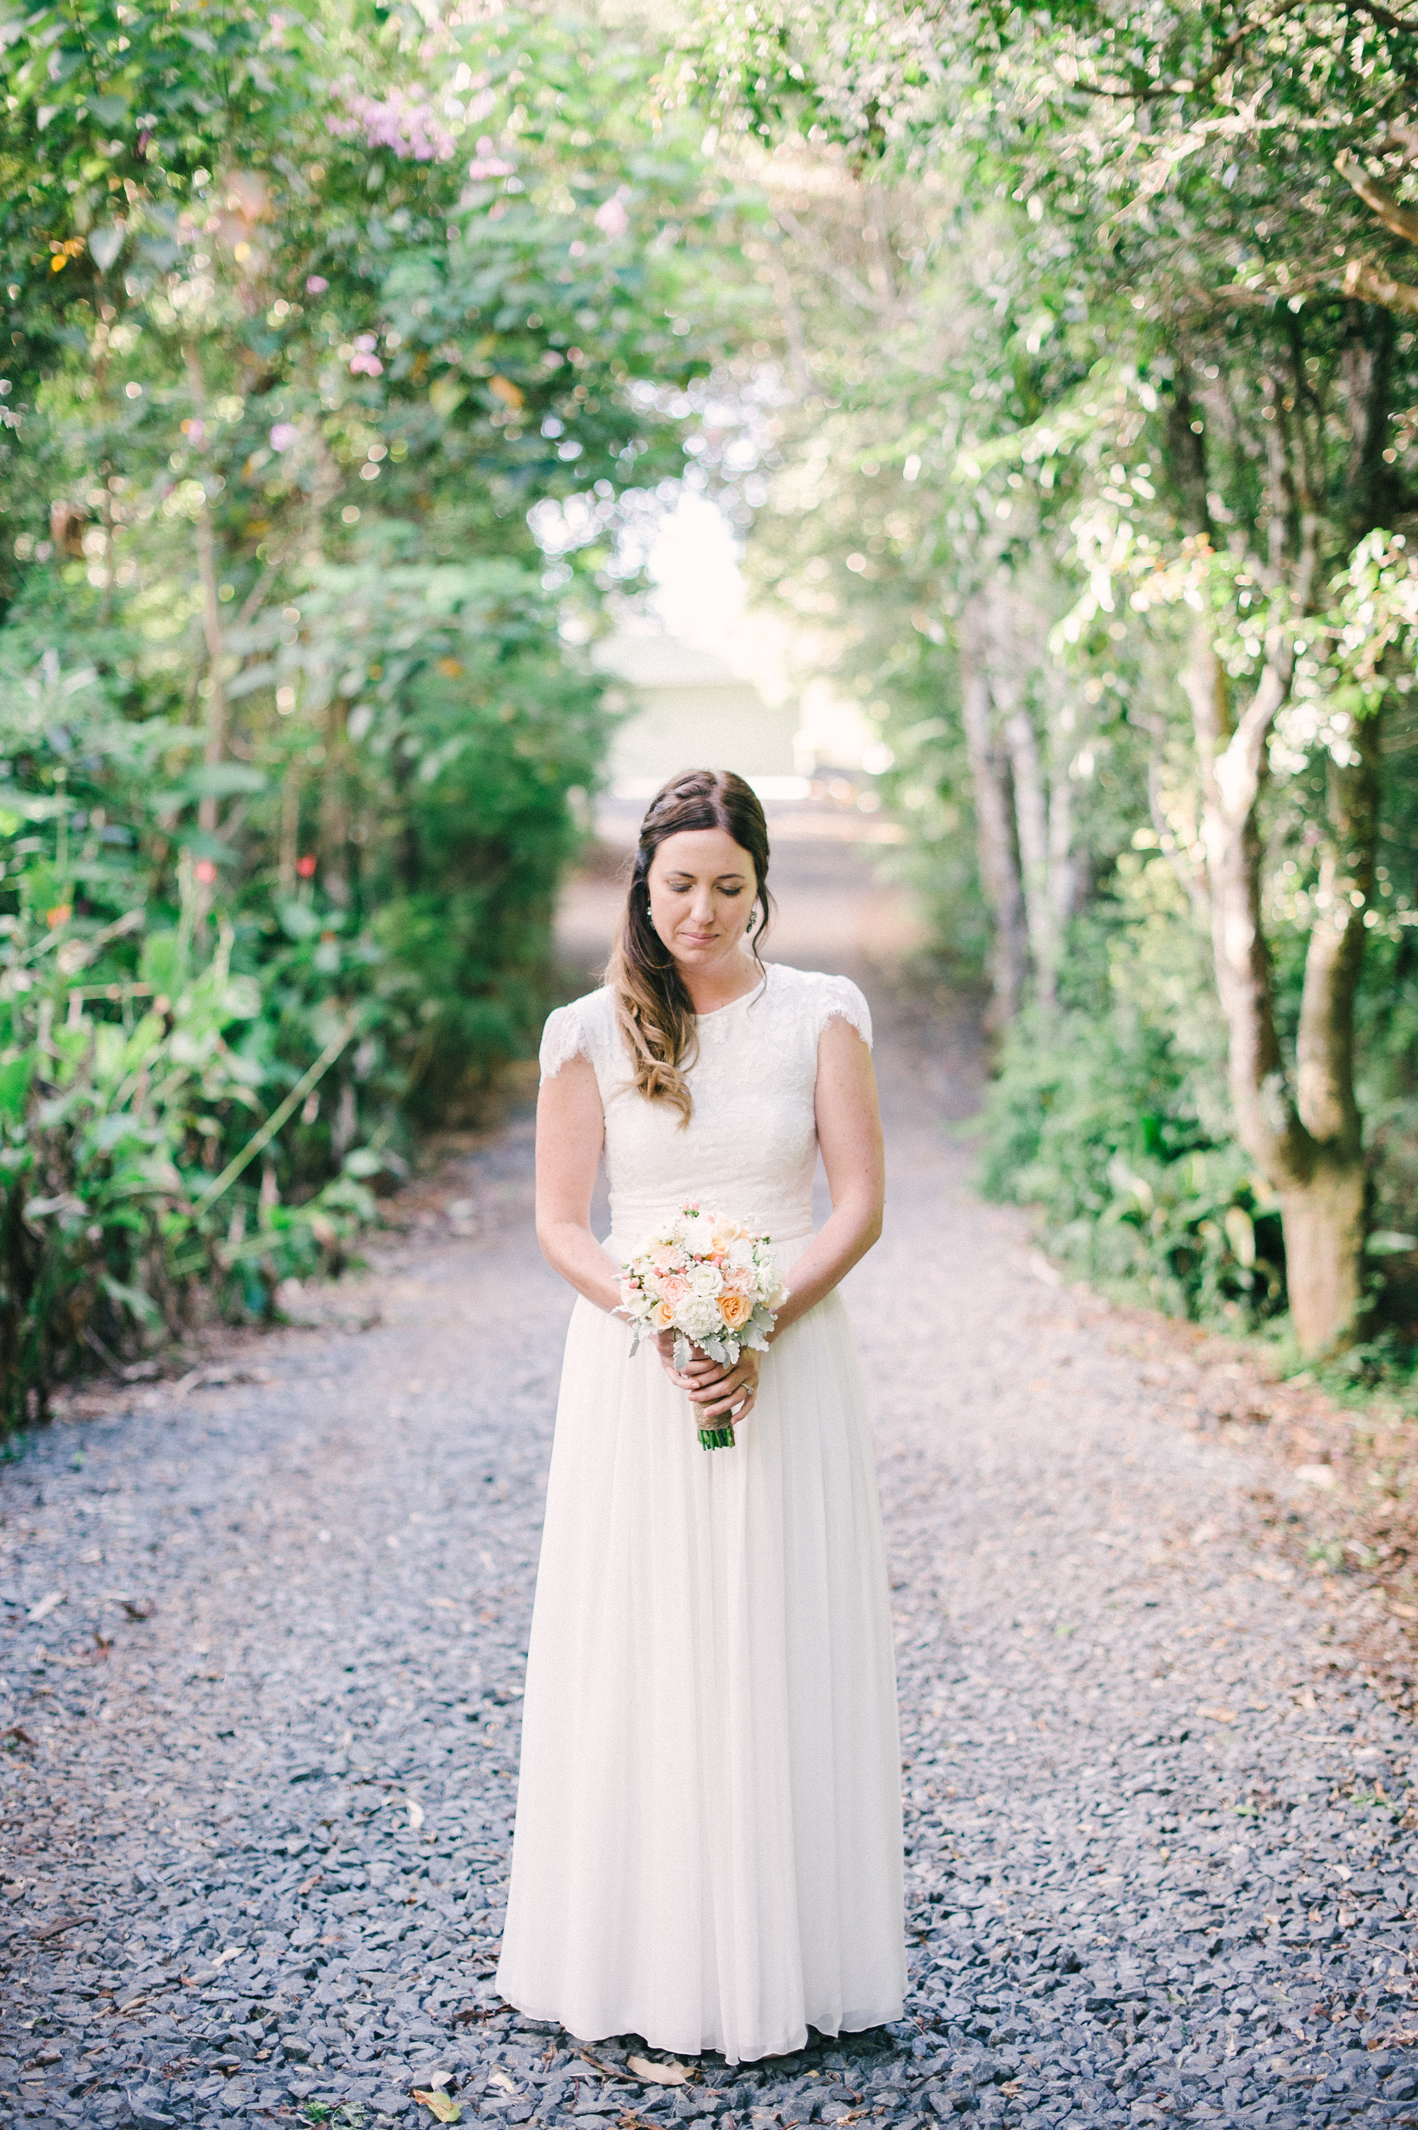 041-michelle-reagan-mount-tamborine-wedding-sophie-baker-photography